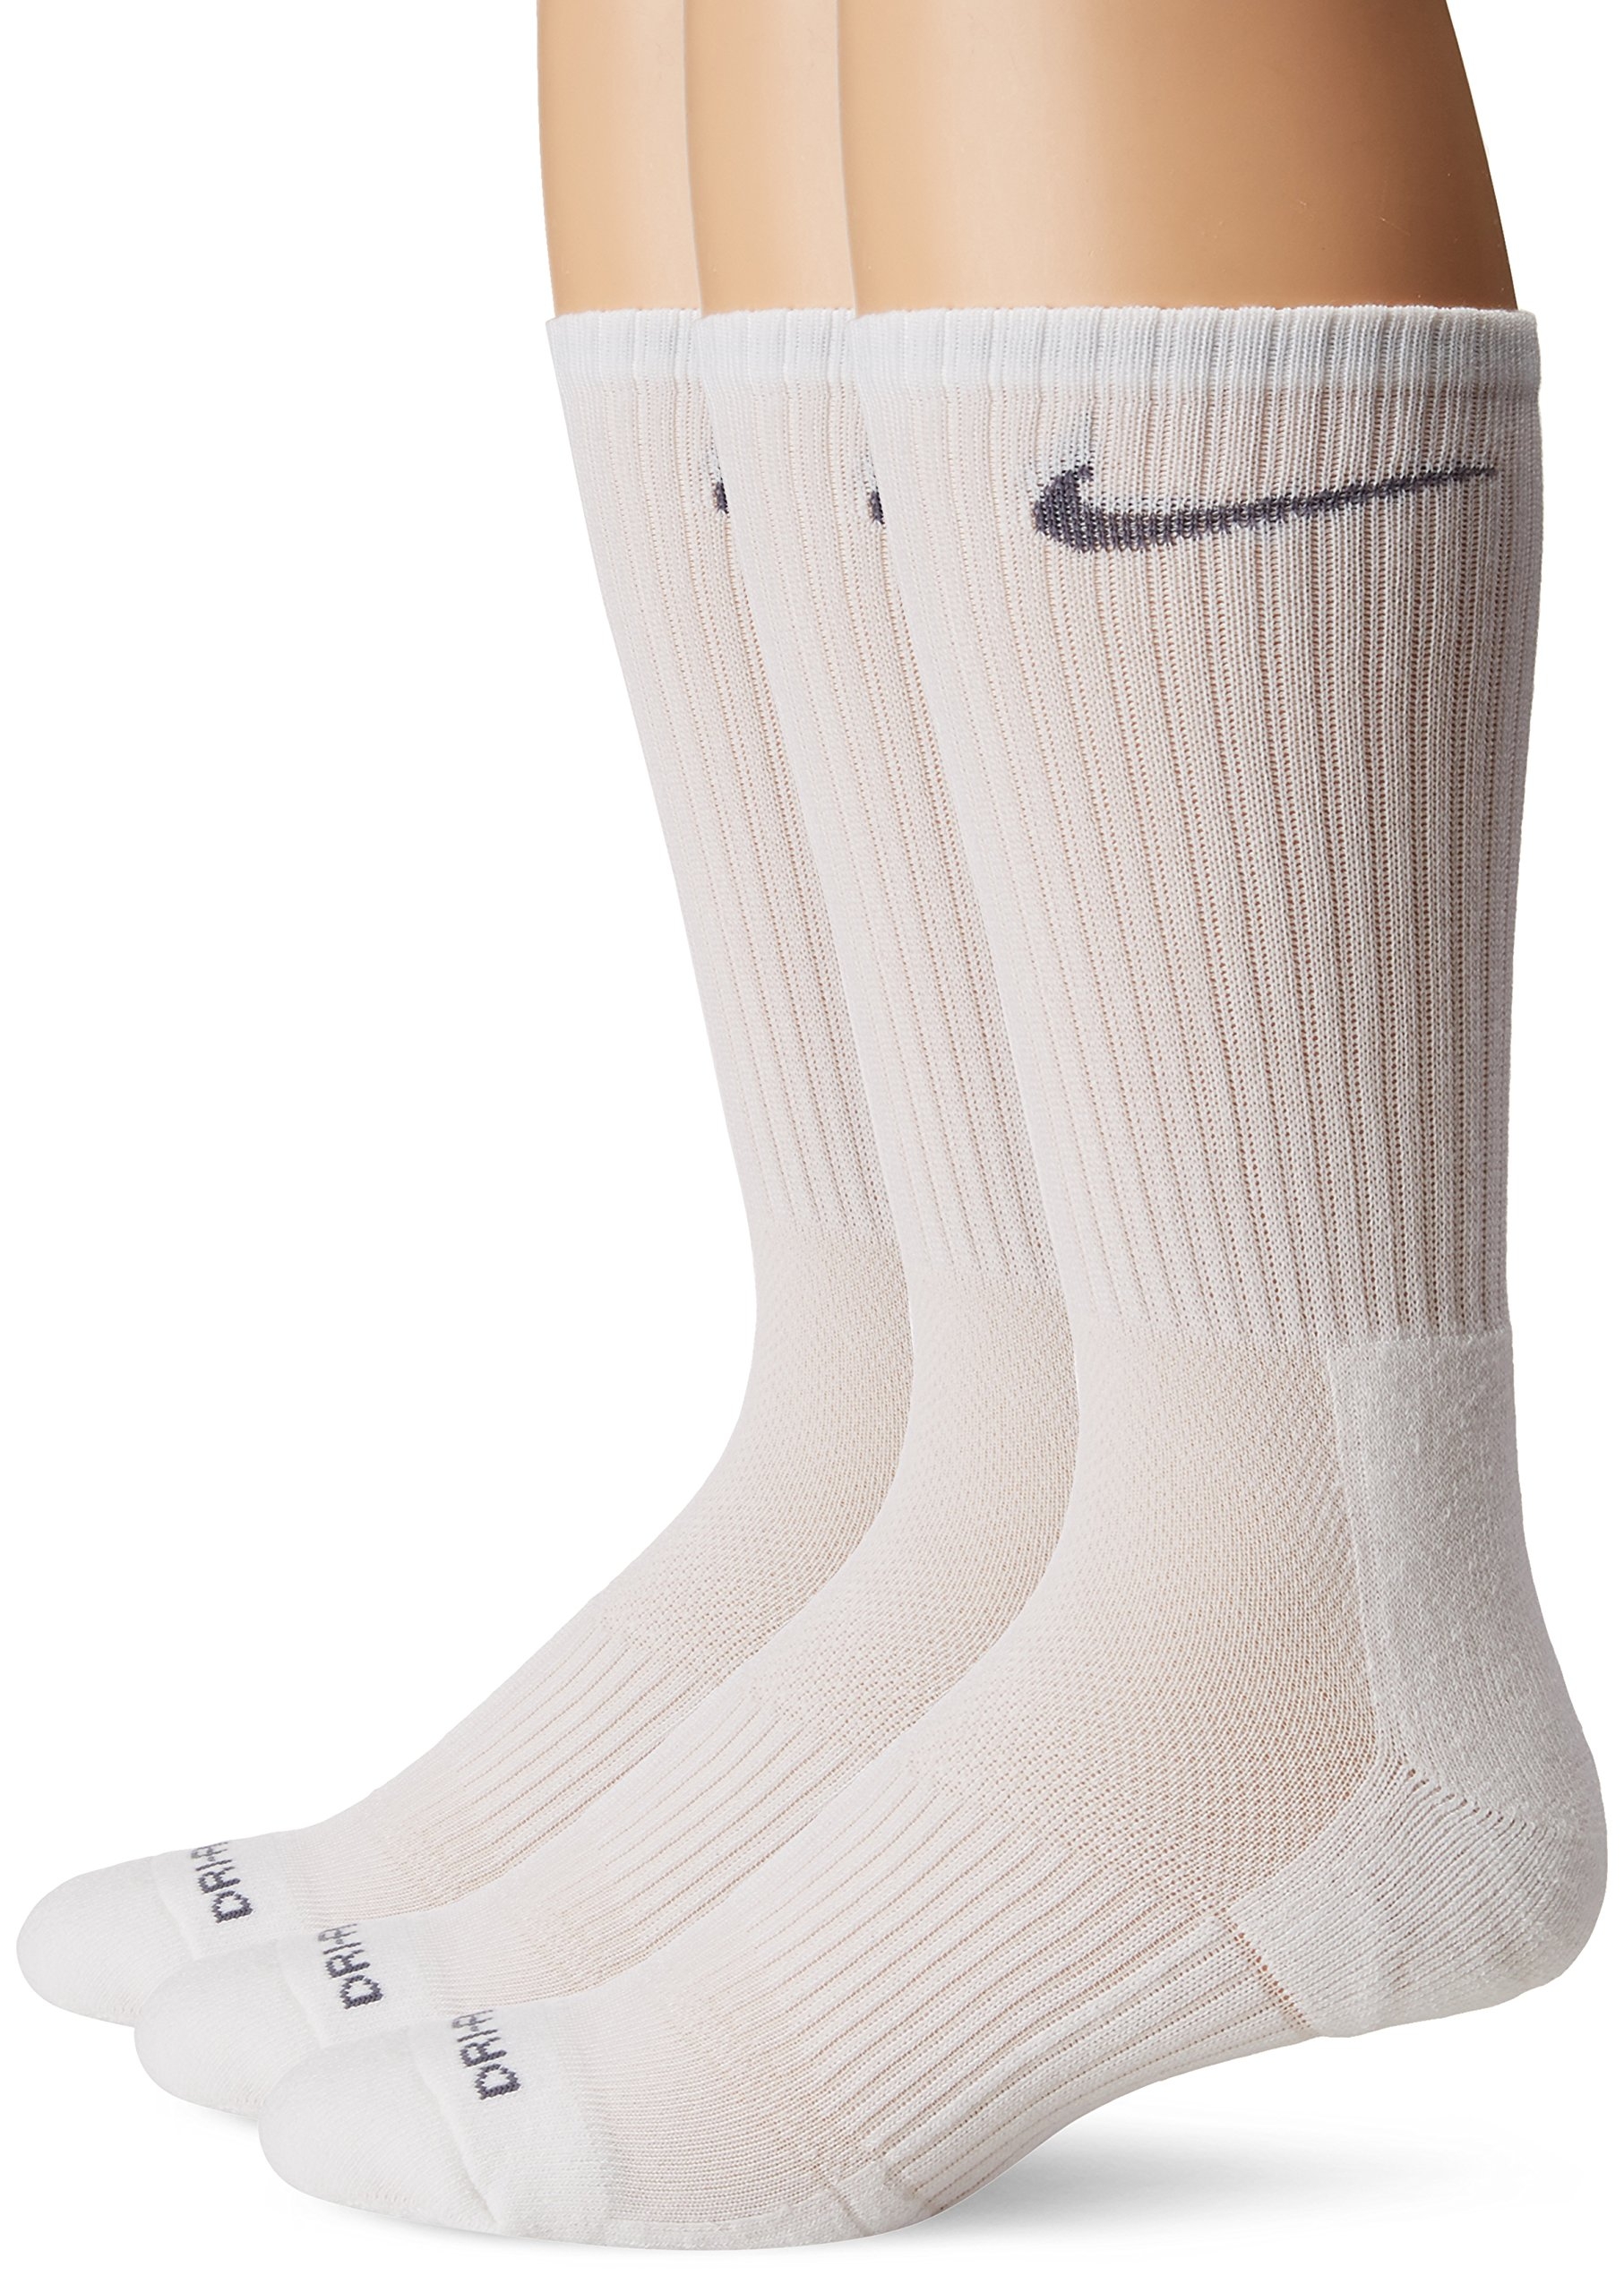 Nike Dri-Fit Cushioned Crew Socks 3 Pack - Men's (XL - Shoe Size: 12-15, White) by Nike